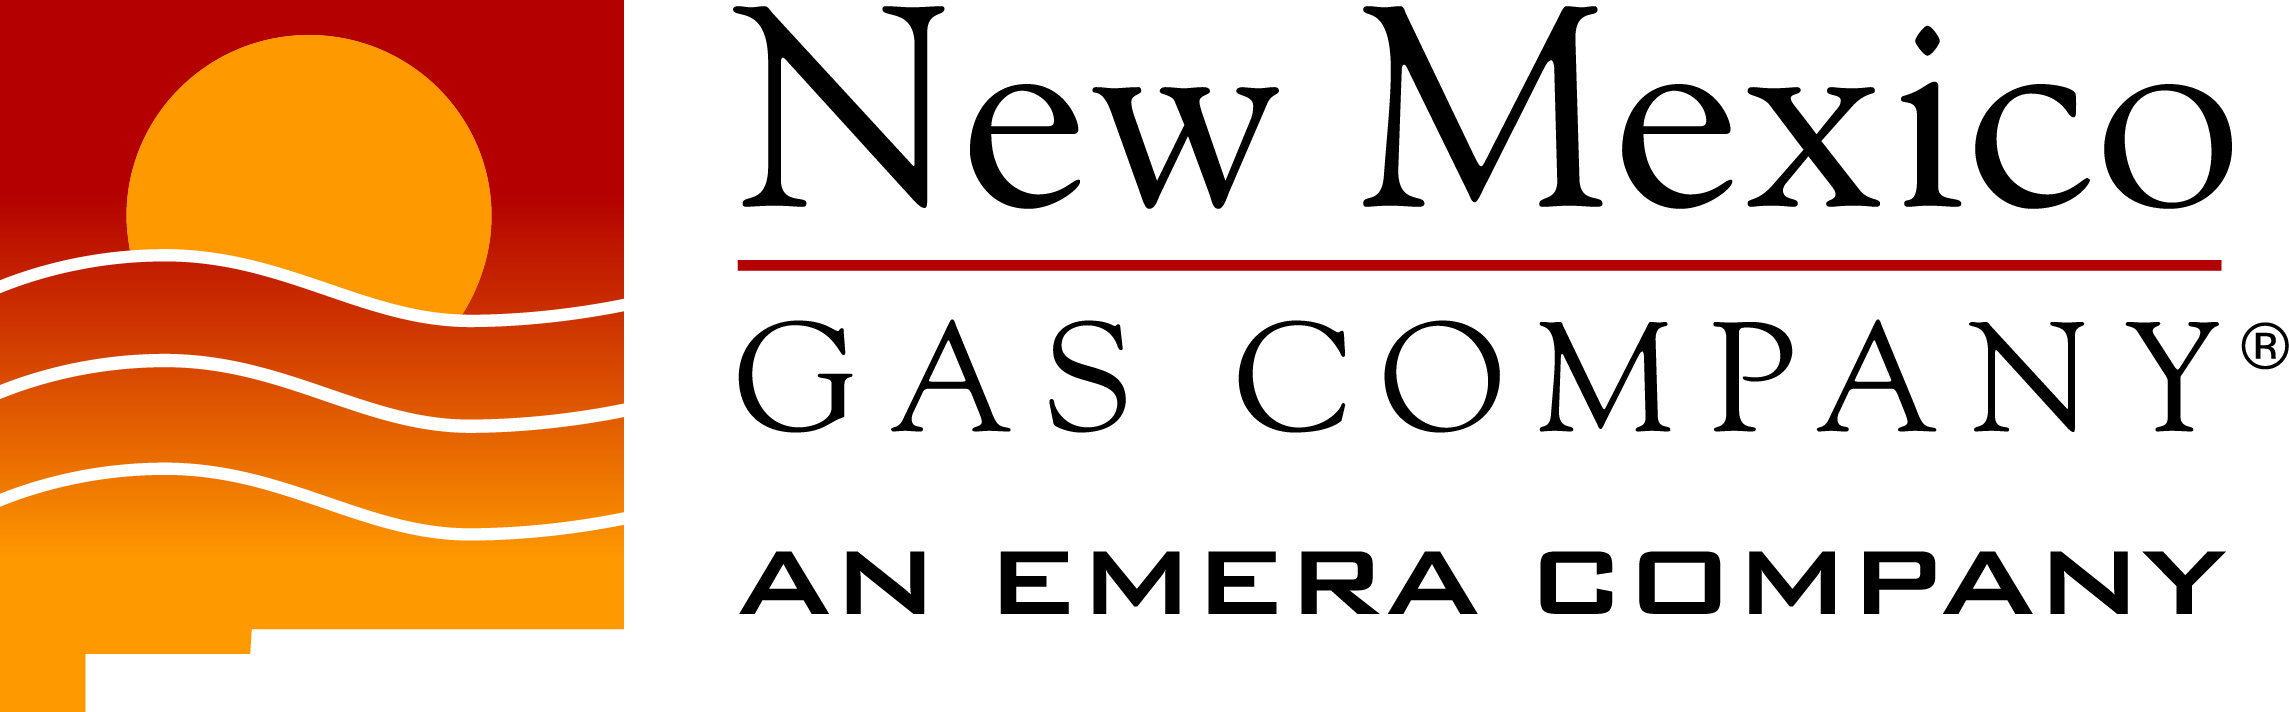 New Mexico Gas Company, Inc.